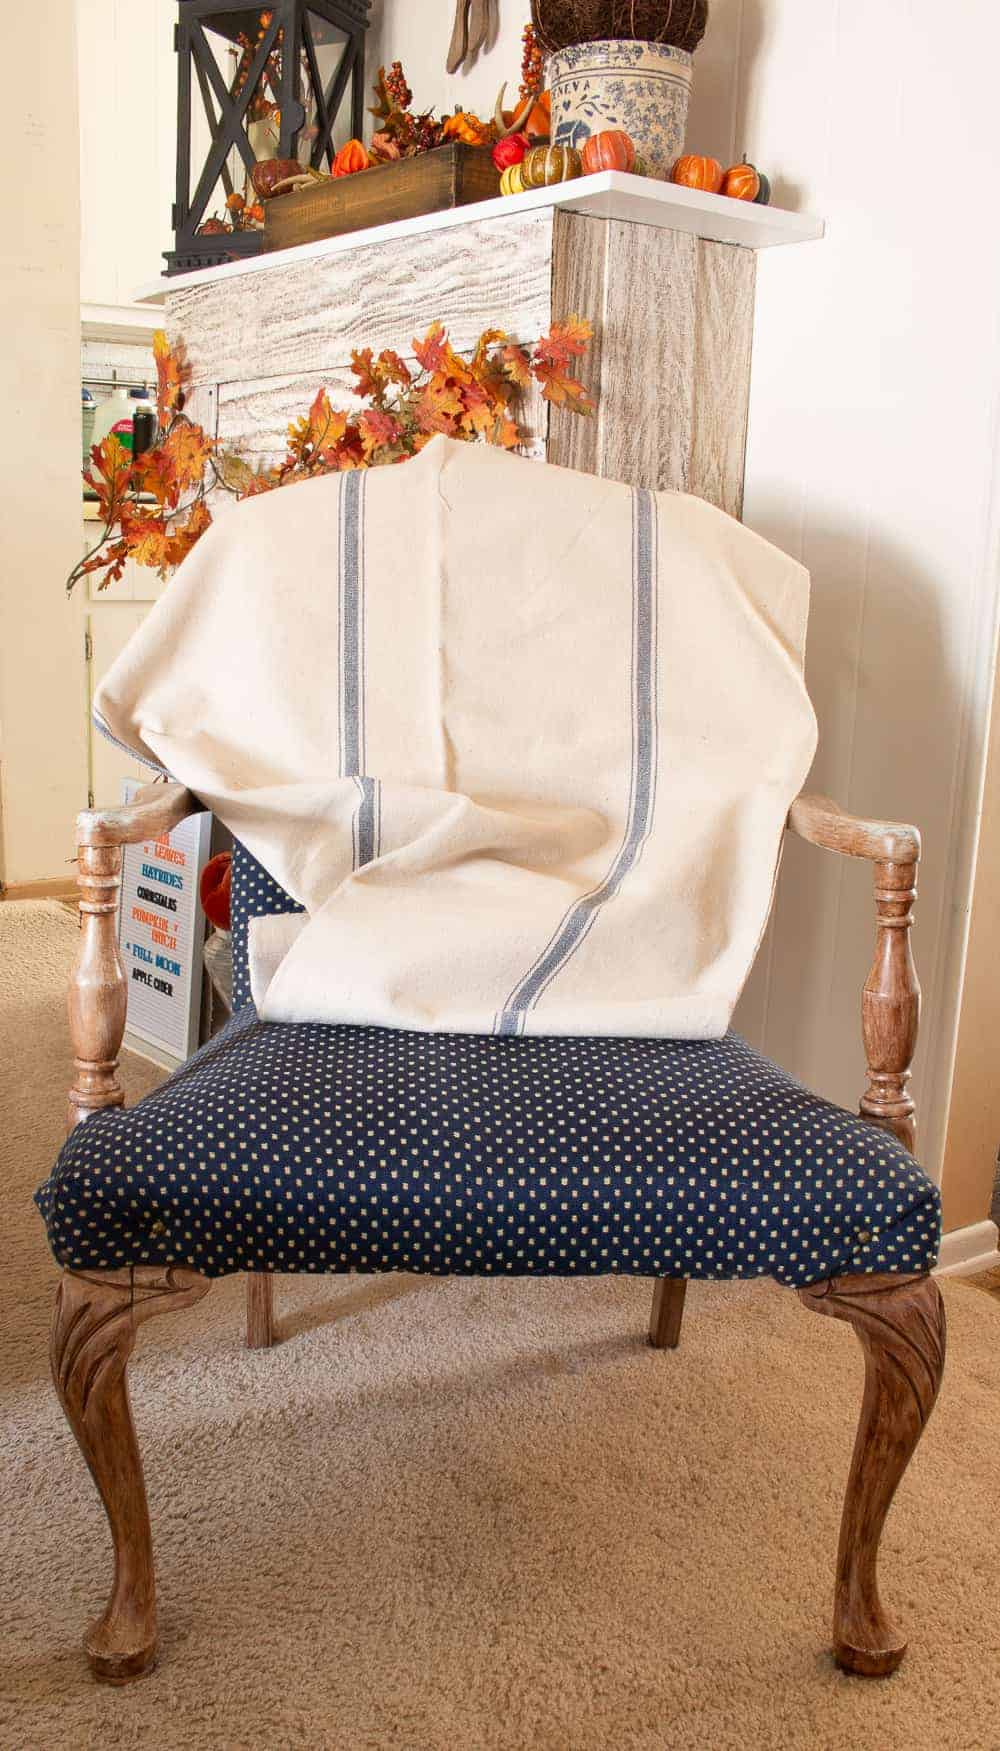 grain sac fabric draped over vintage fabric chair